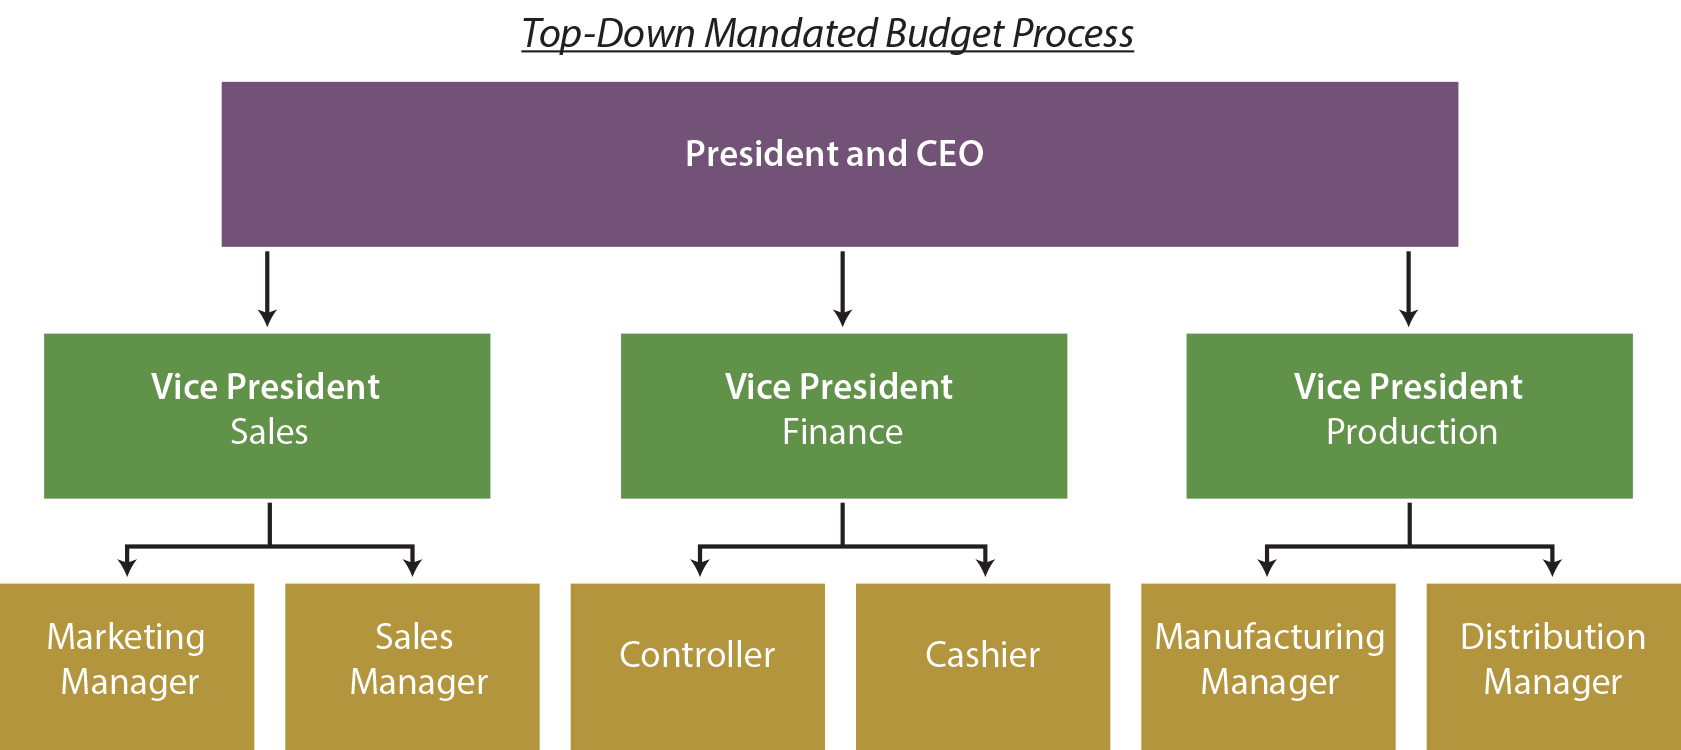 Budget Processes And Human Behavior - principlesofaccounting com